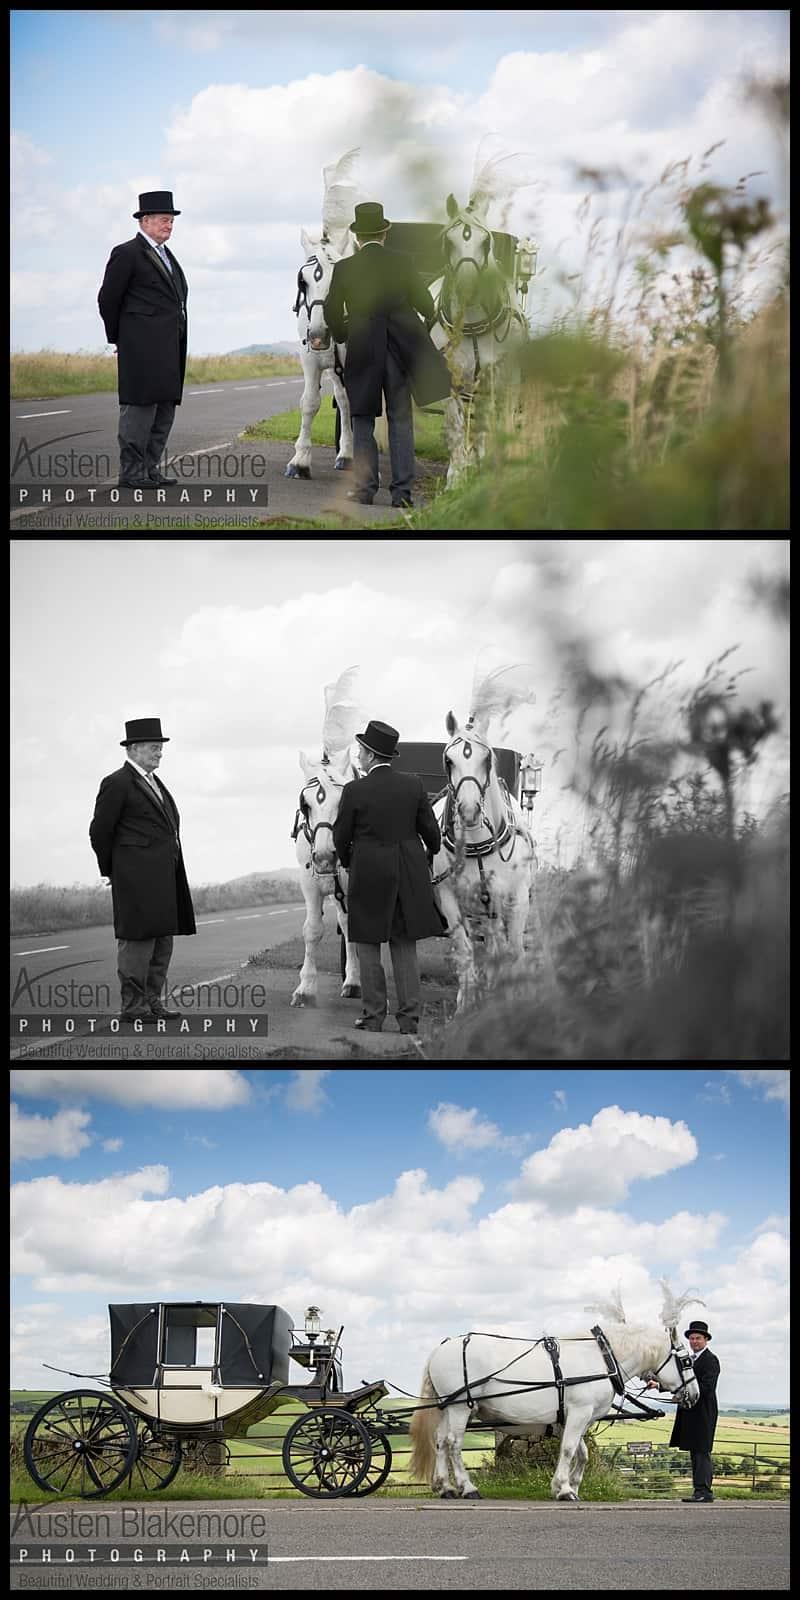 Horse & Carrage   Sami Tipi   Images by Austin Blakemore